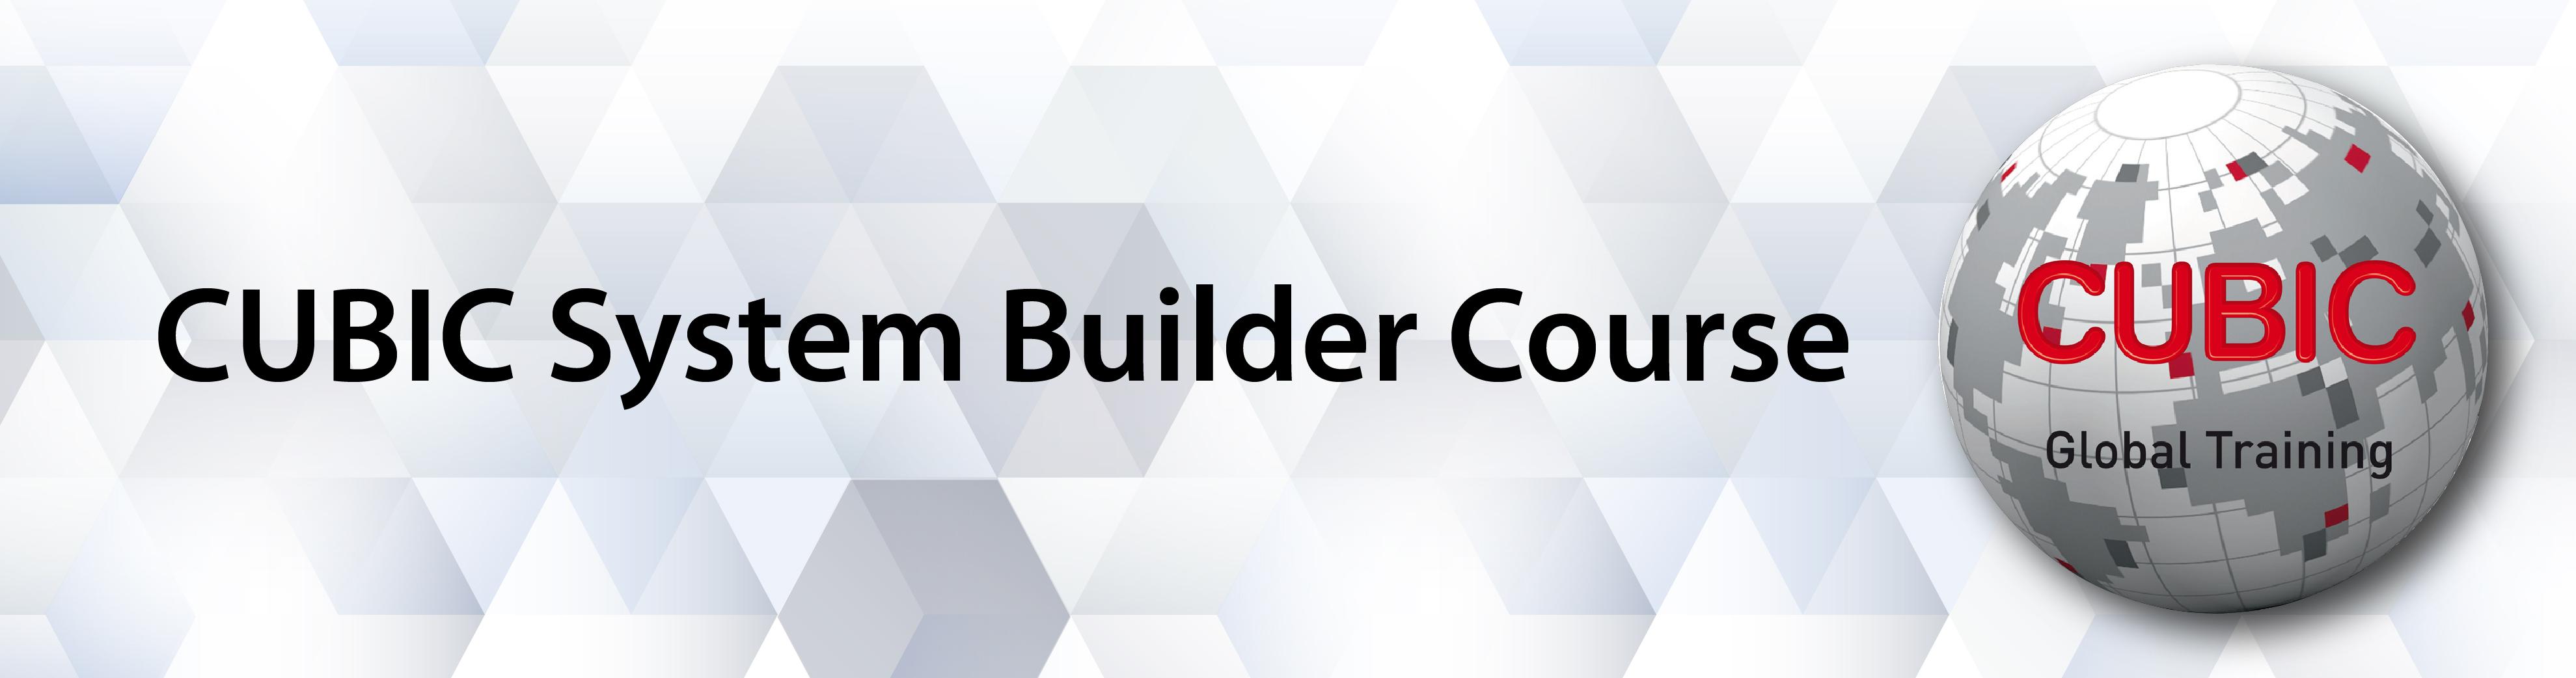 CUBIC System Builder Course Banner_950 X 250  V2-0